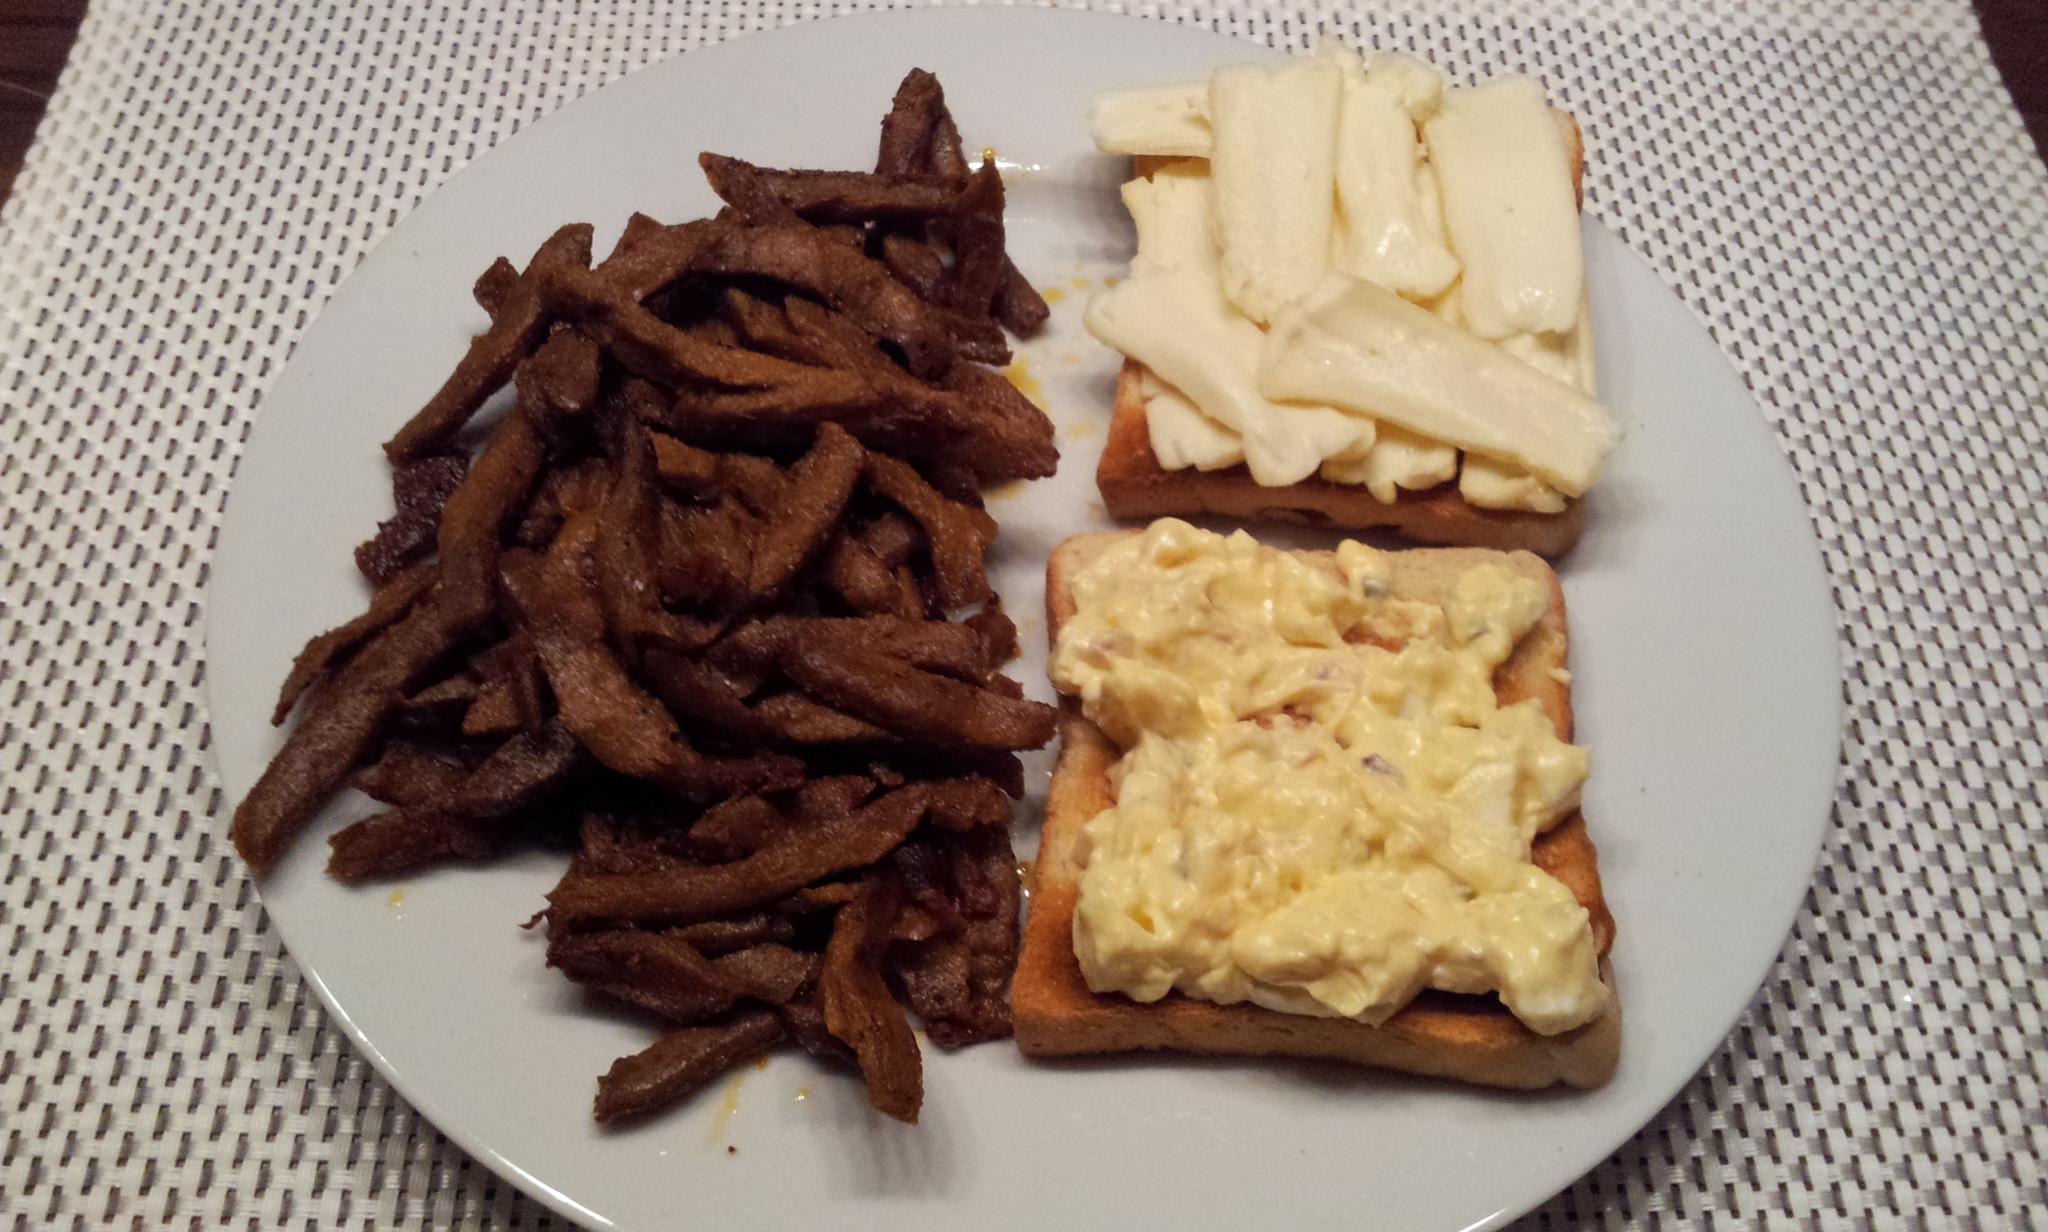 https://foodloader.net/Holz_2013-02-25_Gyros_mit_Eier-_und_Camembert-Toasts.jpg